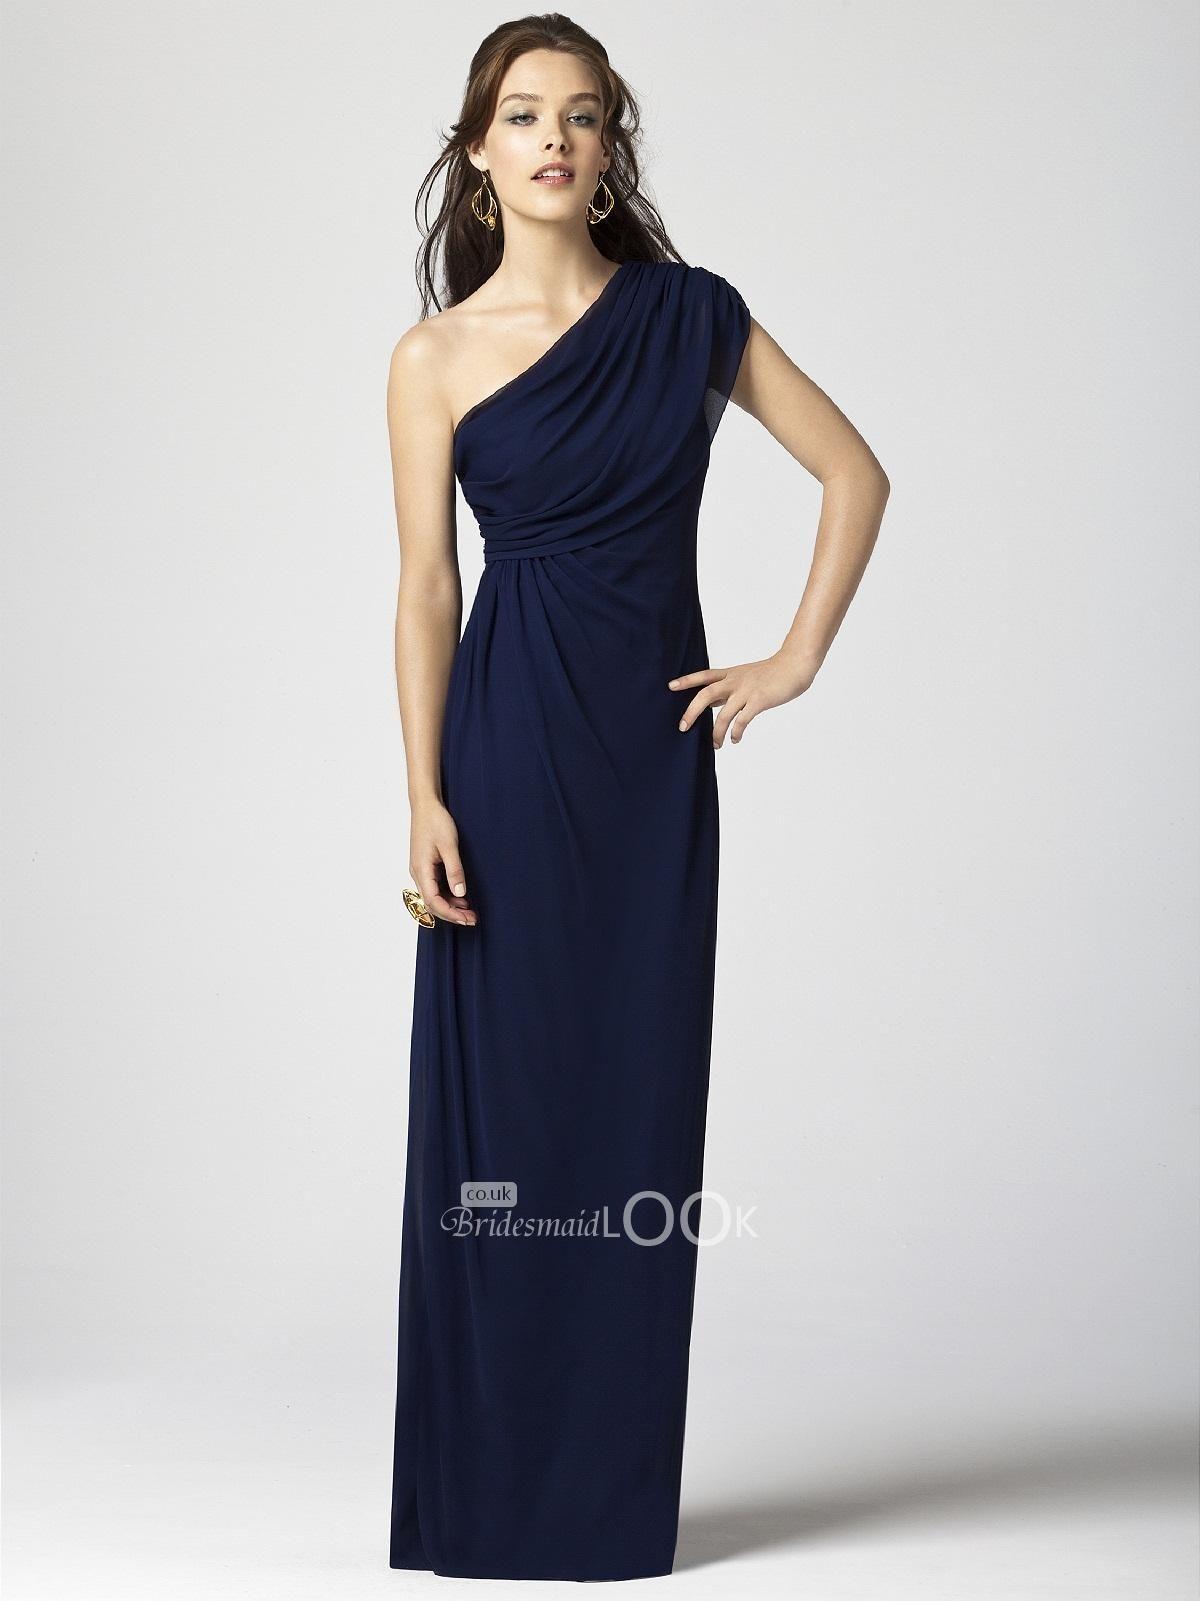 534d4b095a navy one shoulder chiffon floor length bridesmaid gown. Moda VestidosDamas  De Honor ...